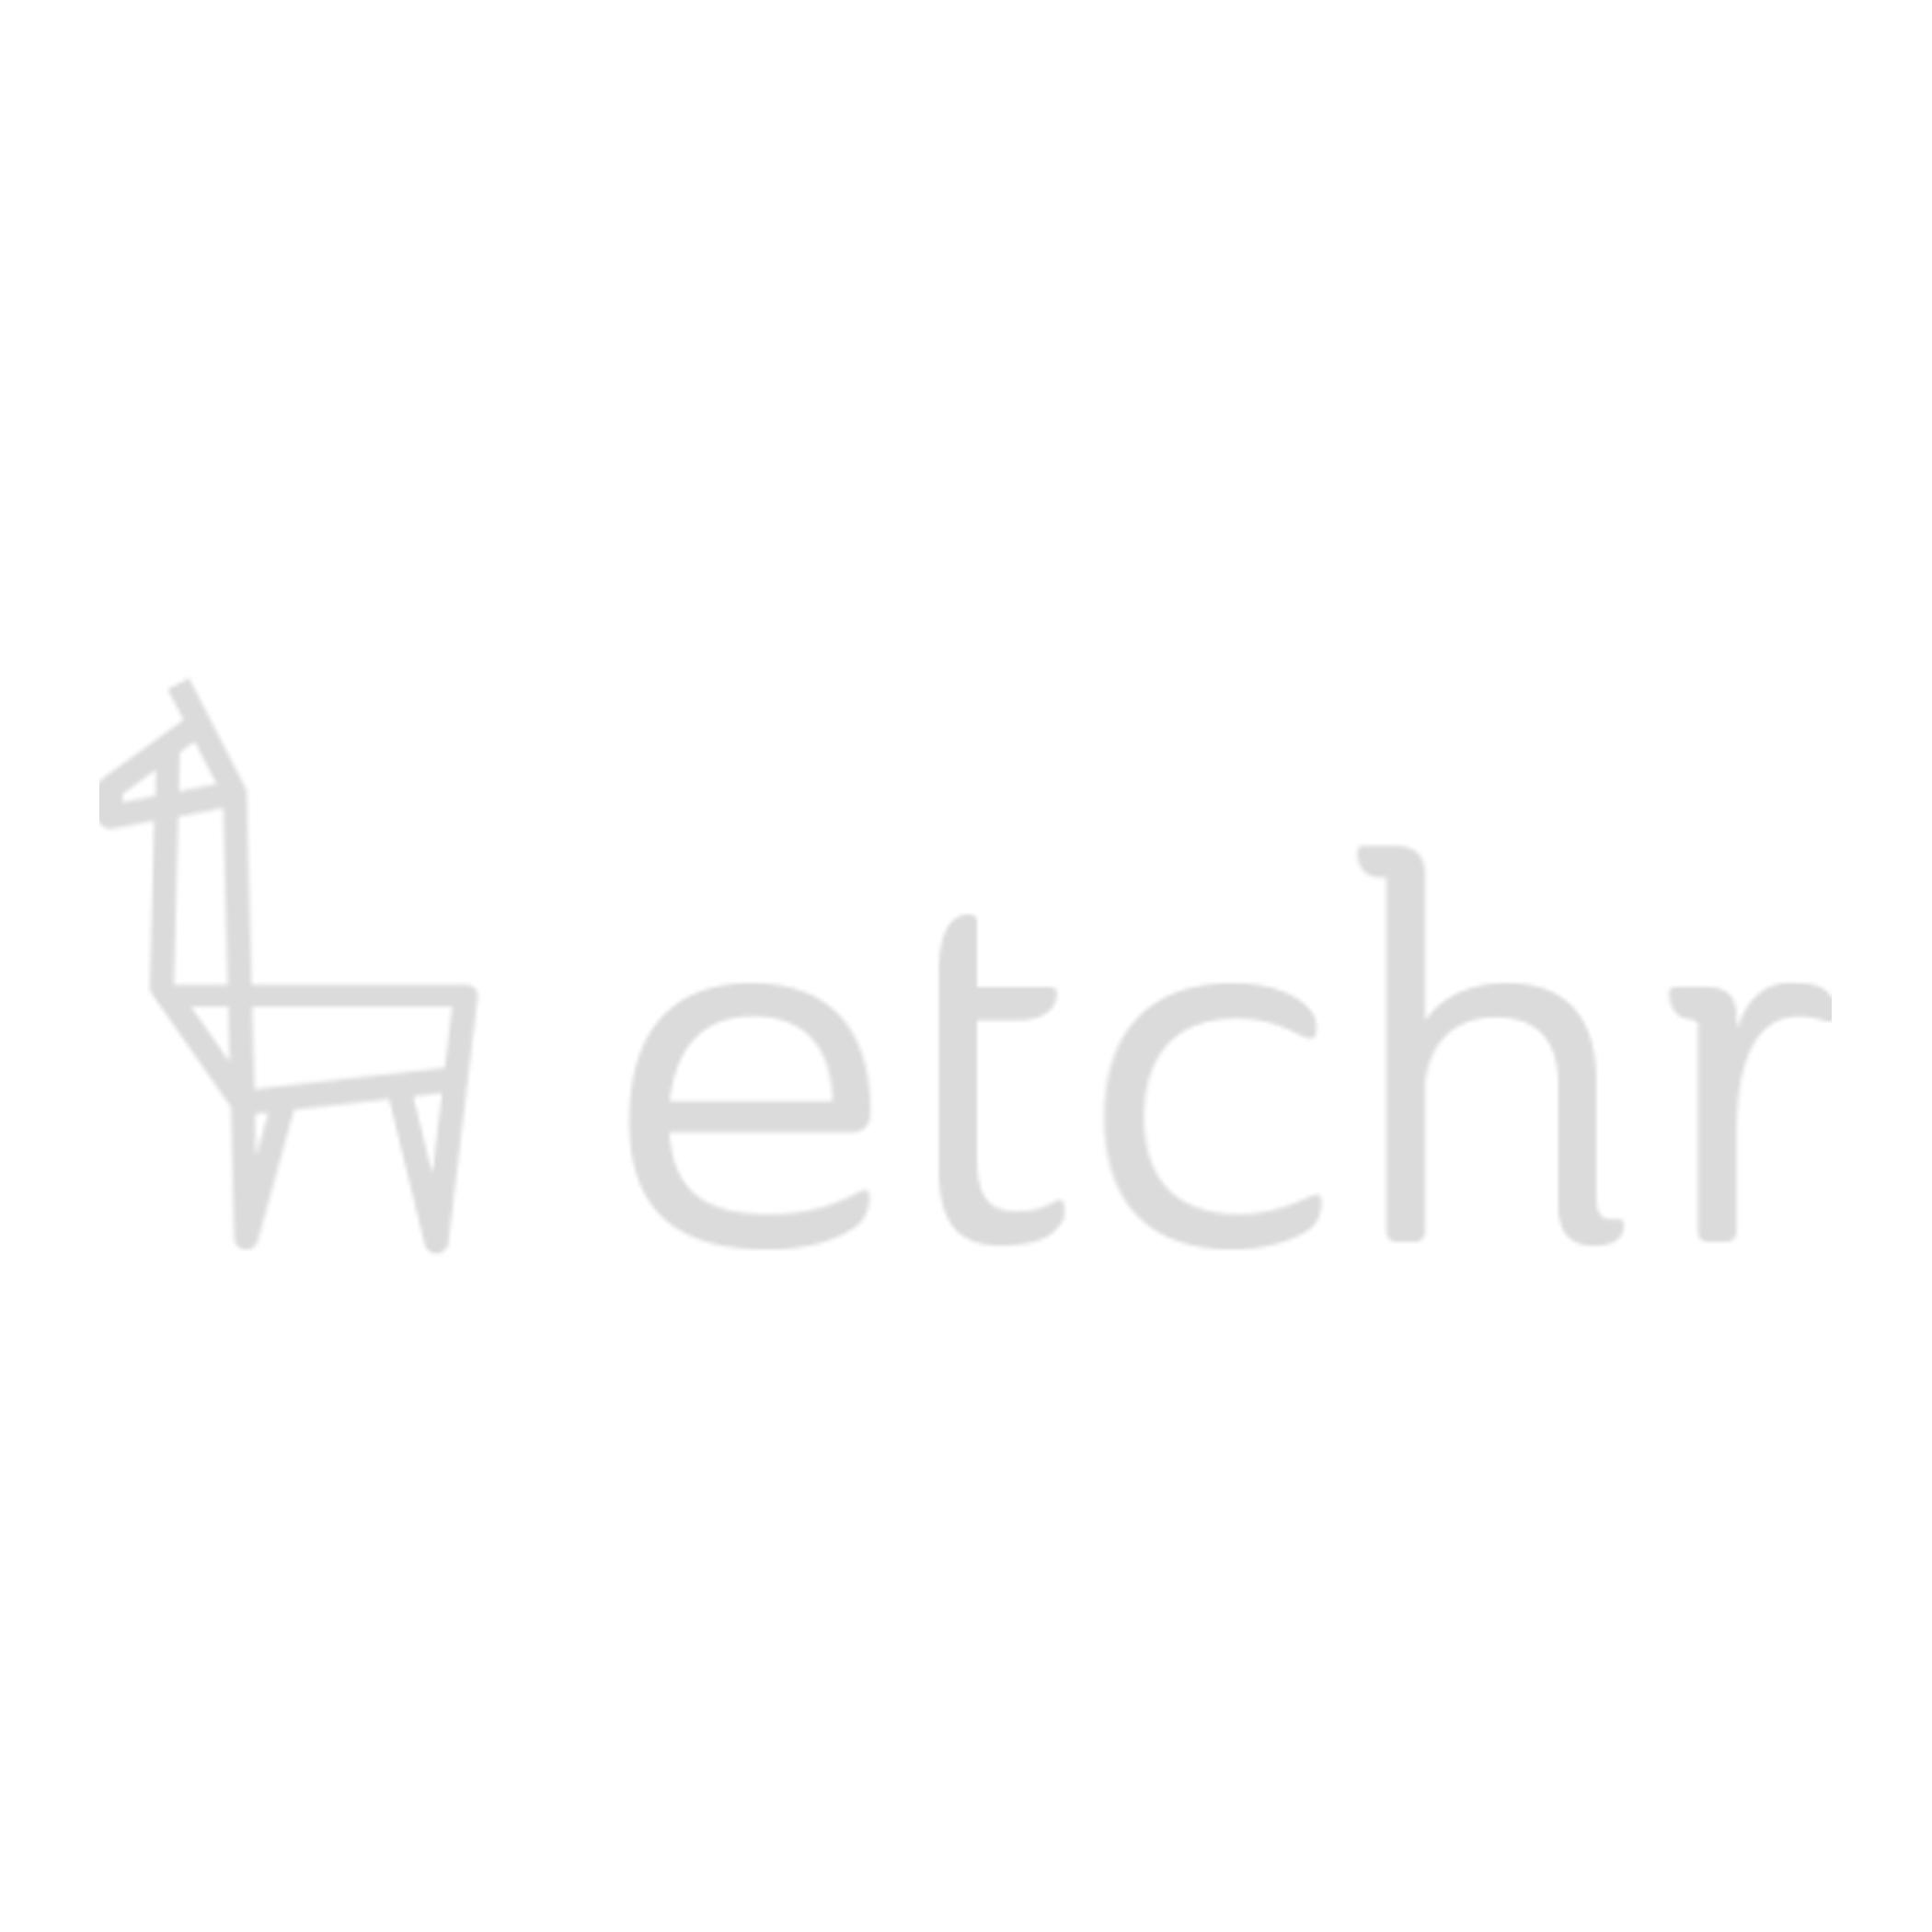 EtchrLab.png